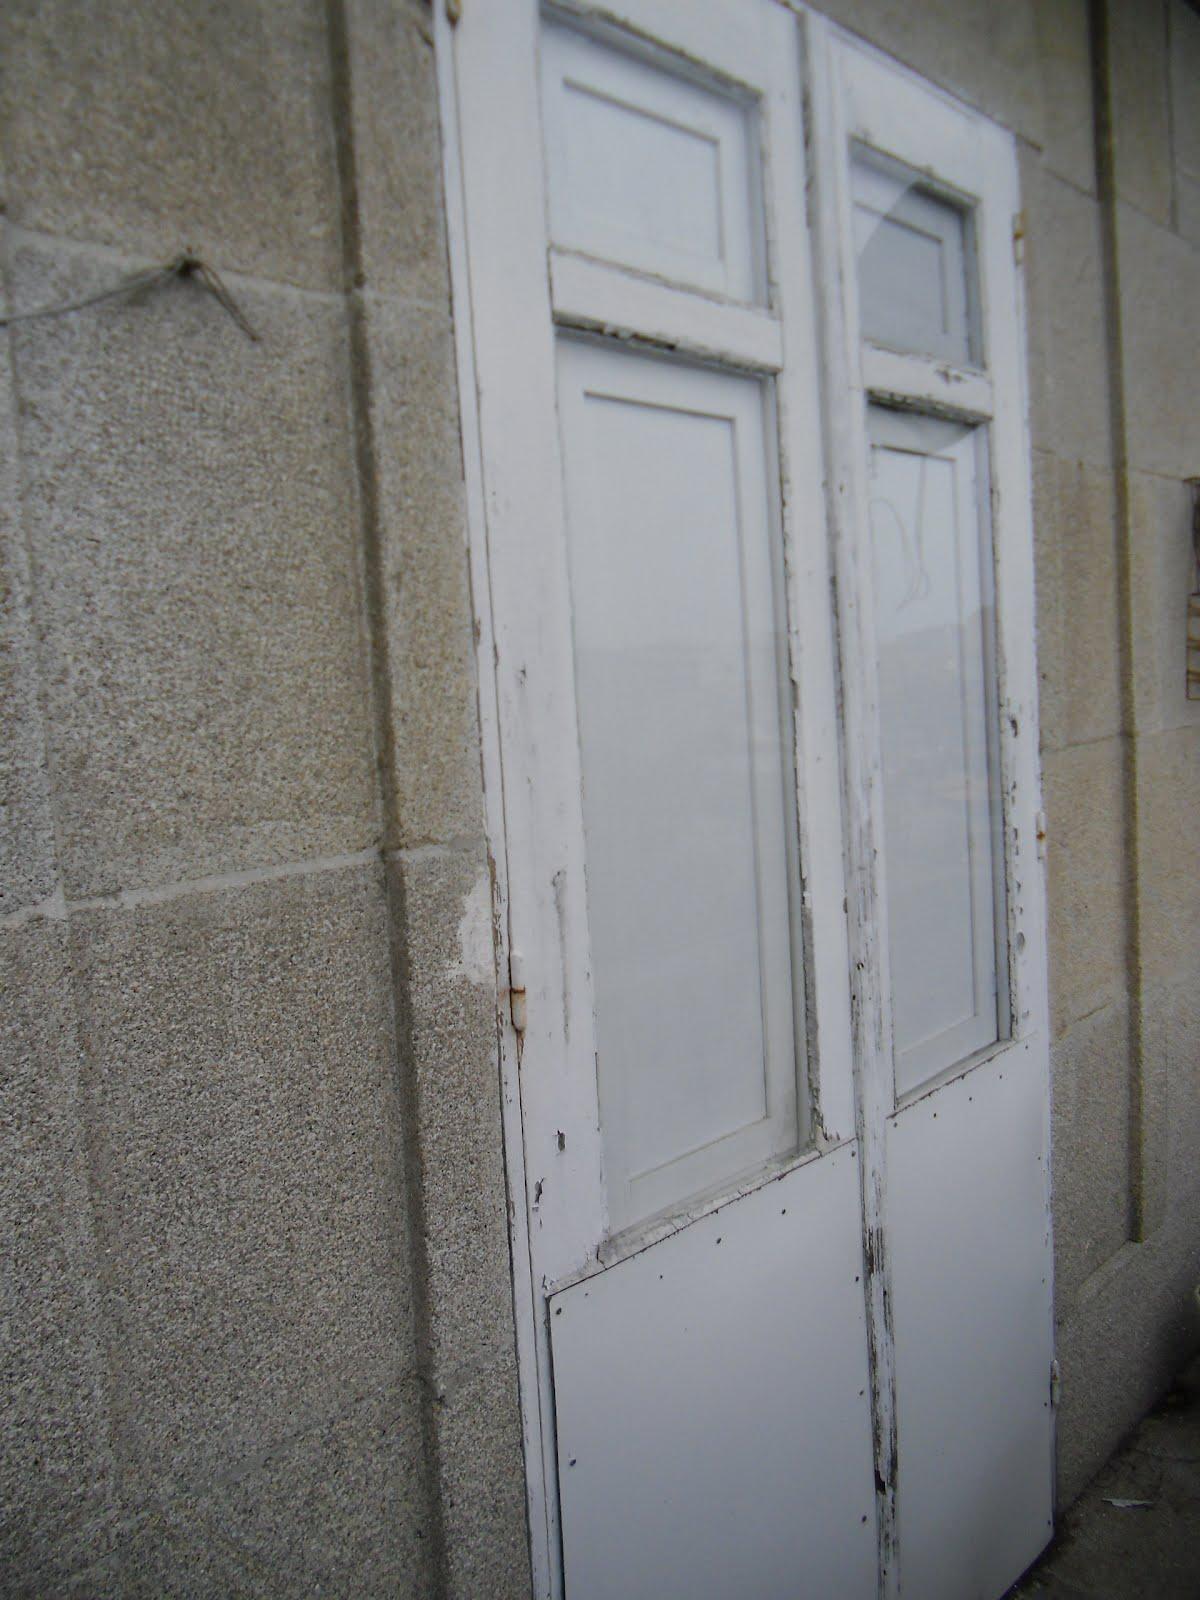 Carpinteria aguete puertas de entrada macizas a medida - Medidas puerta entrada ...